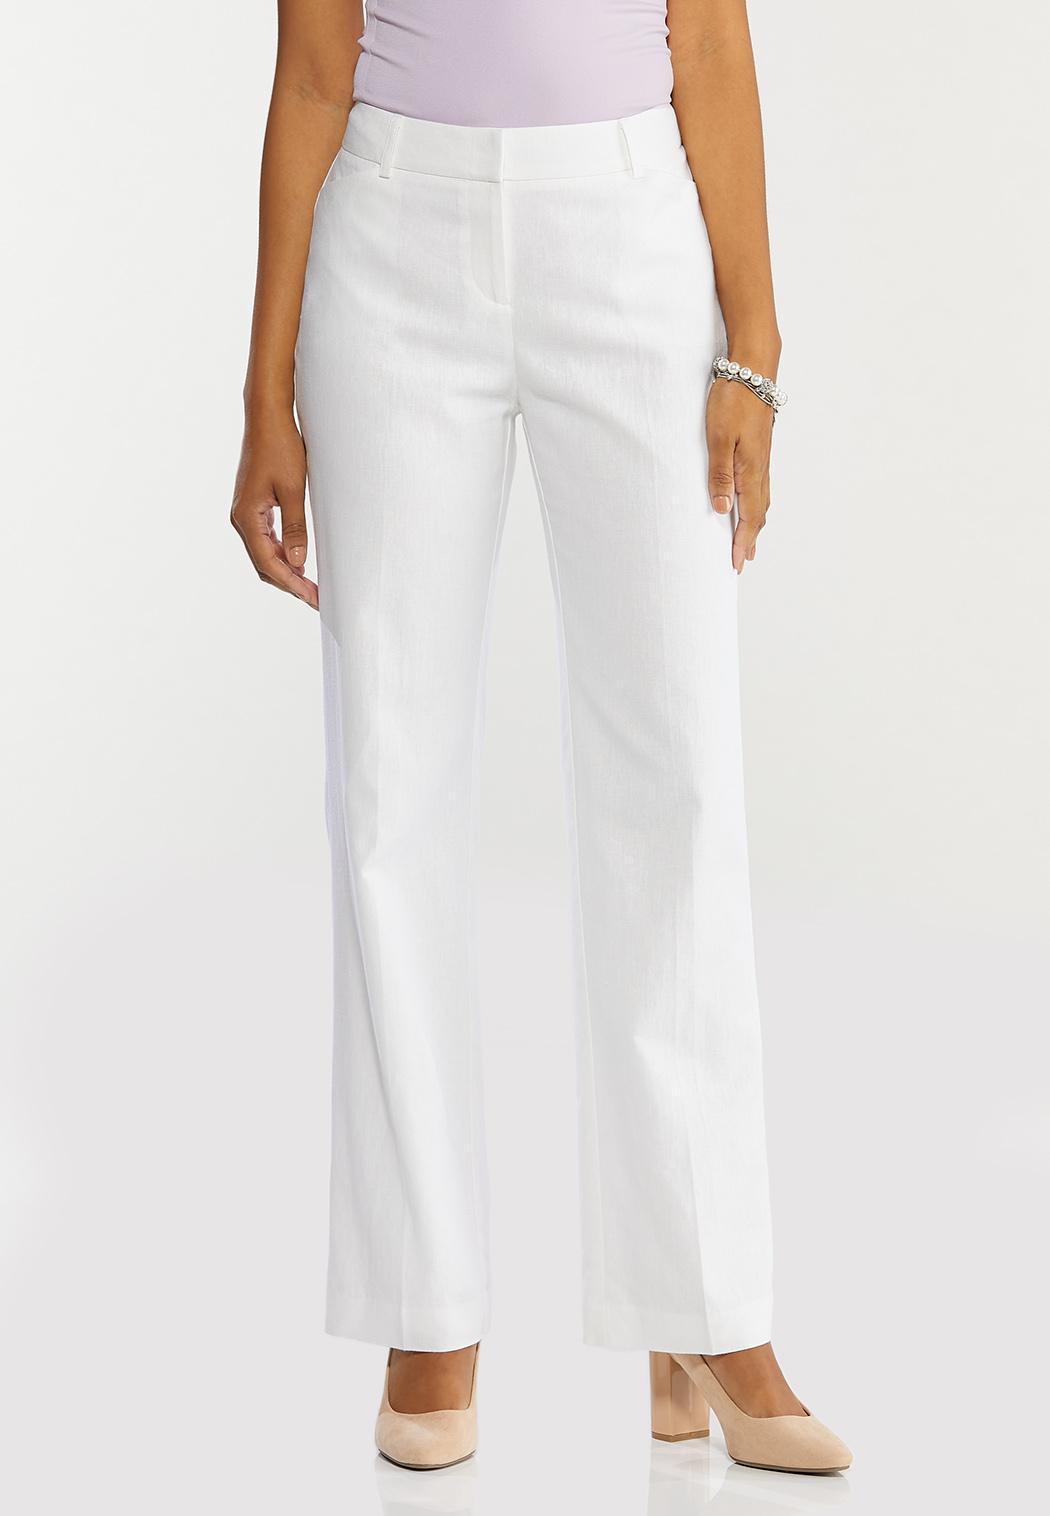 Petite White Linen Trouser Pants